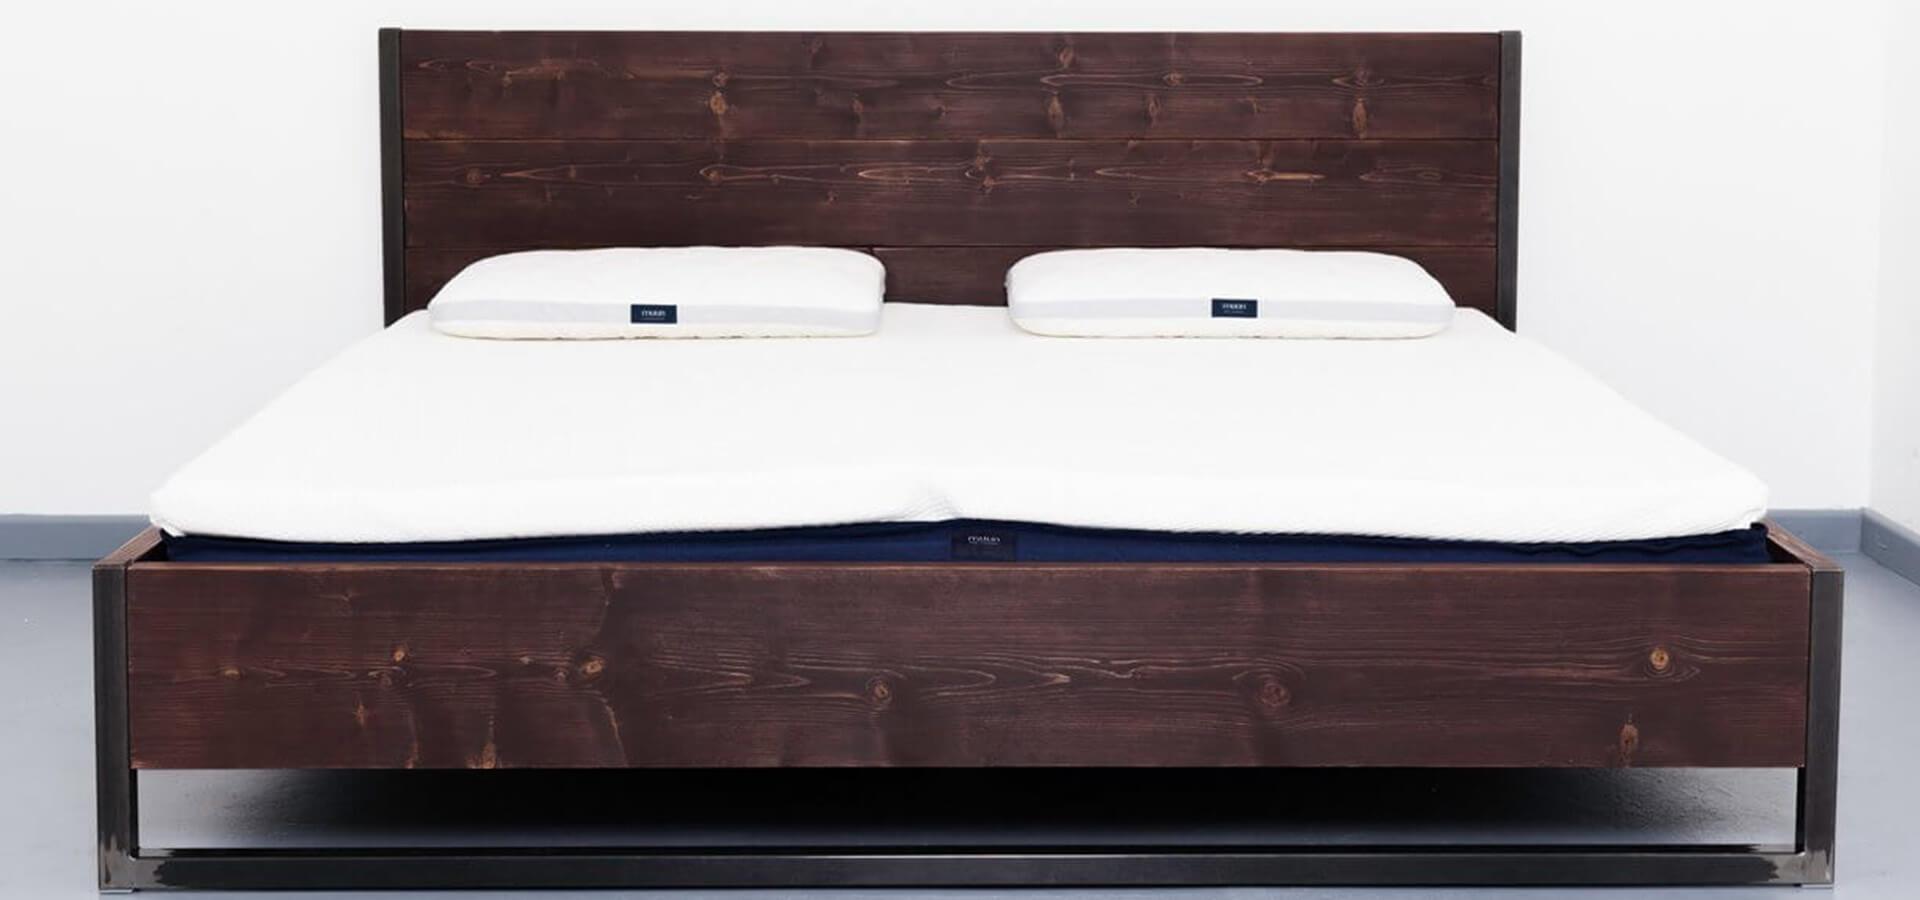 Bett Aus Altholz Entdecke Einzigartige Bettgestelle Satamo